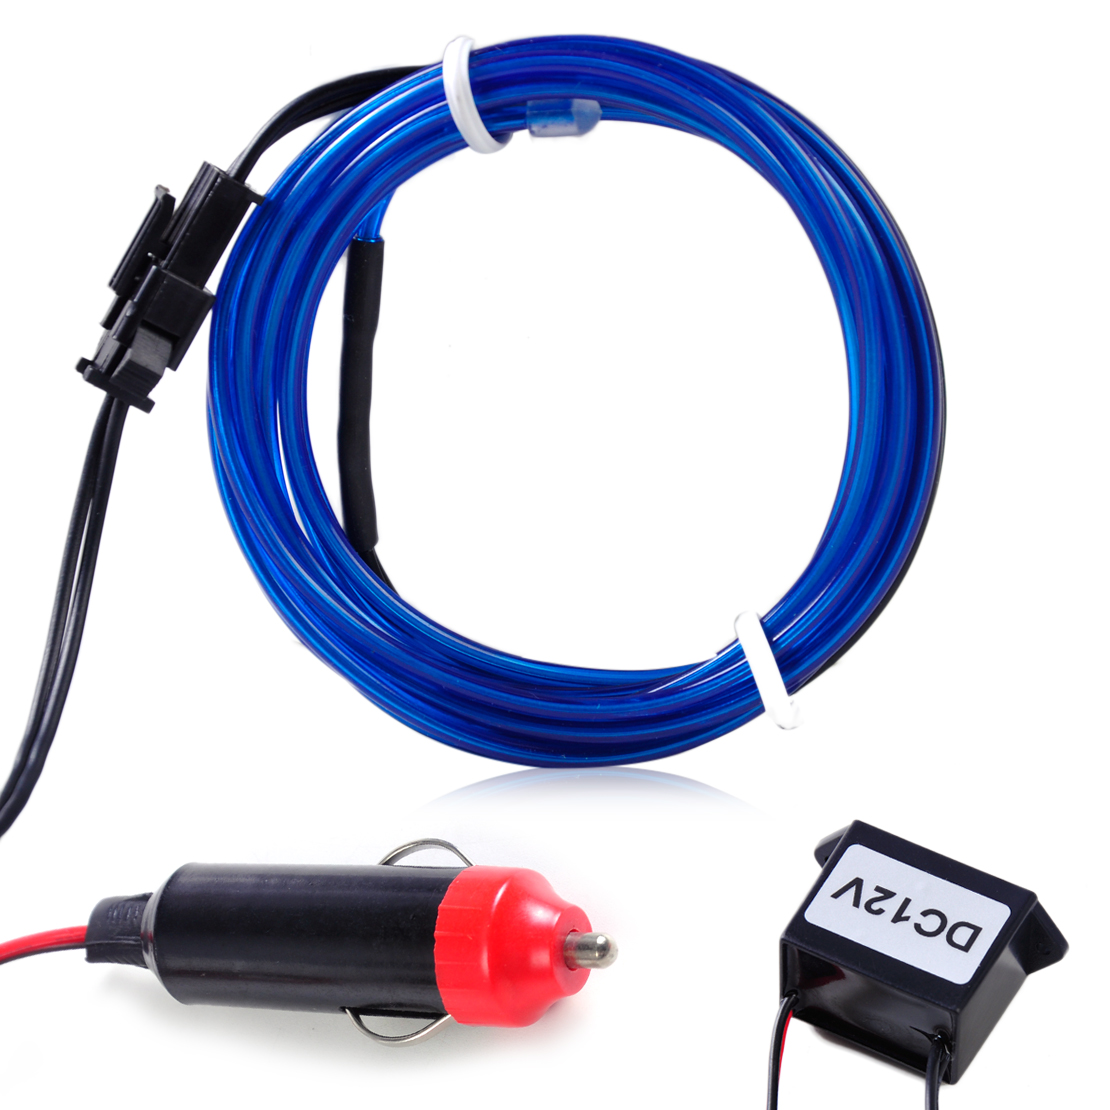 12v el wire flexible car interior decor fluorescent neon strip cold light tape ebay. Black Bedroom Furniture Sets. Home Design Ideas